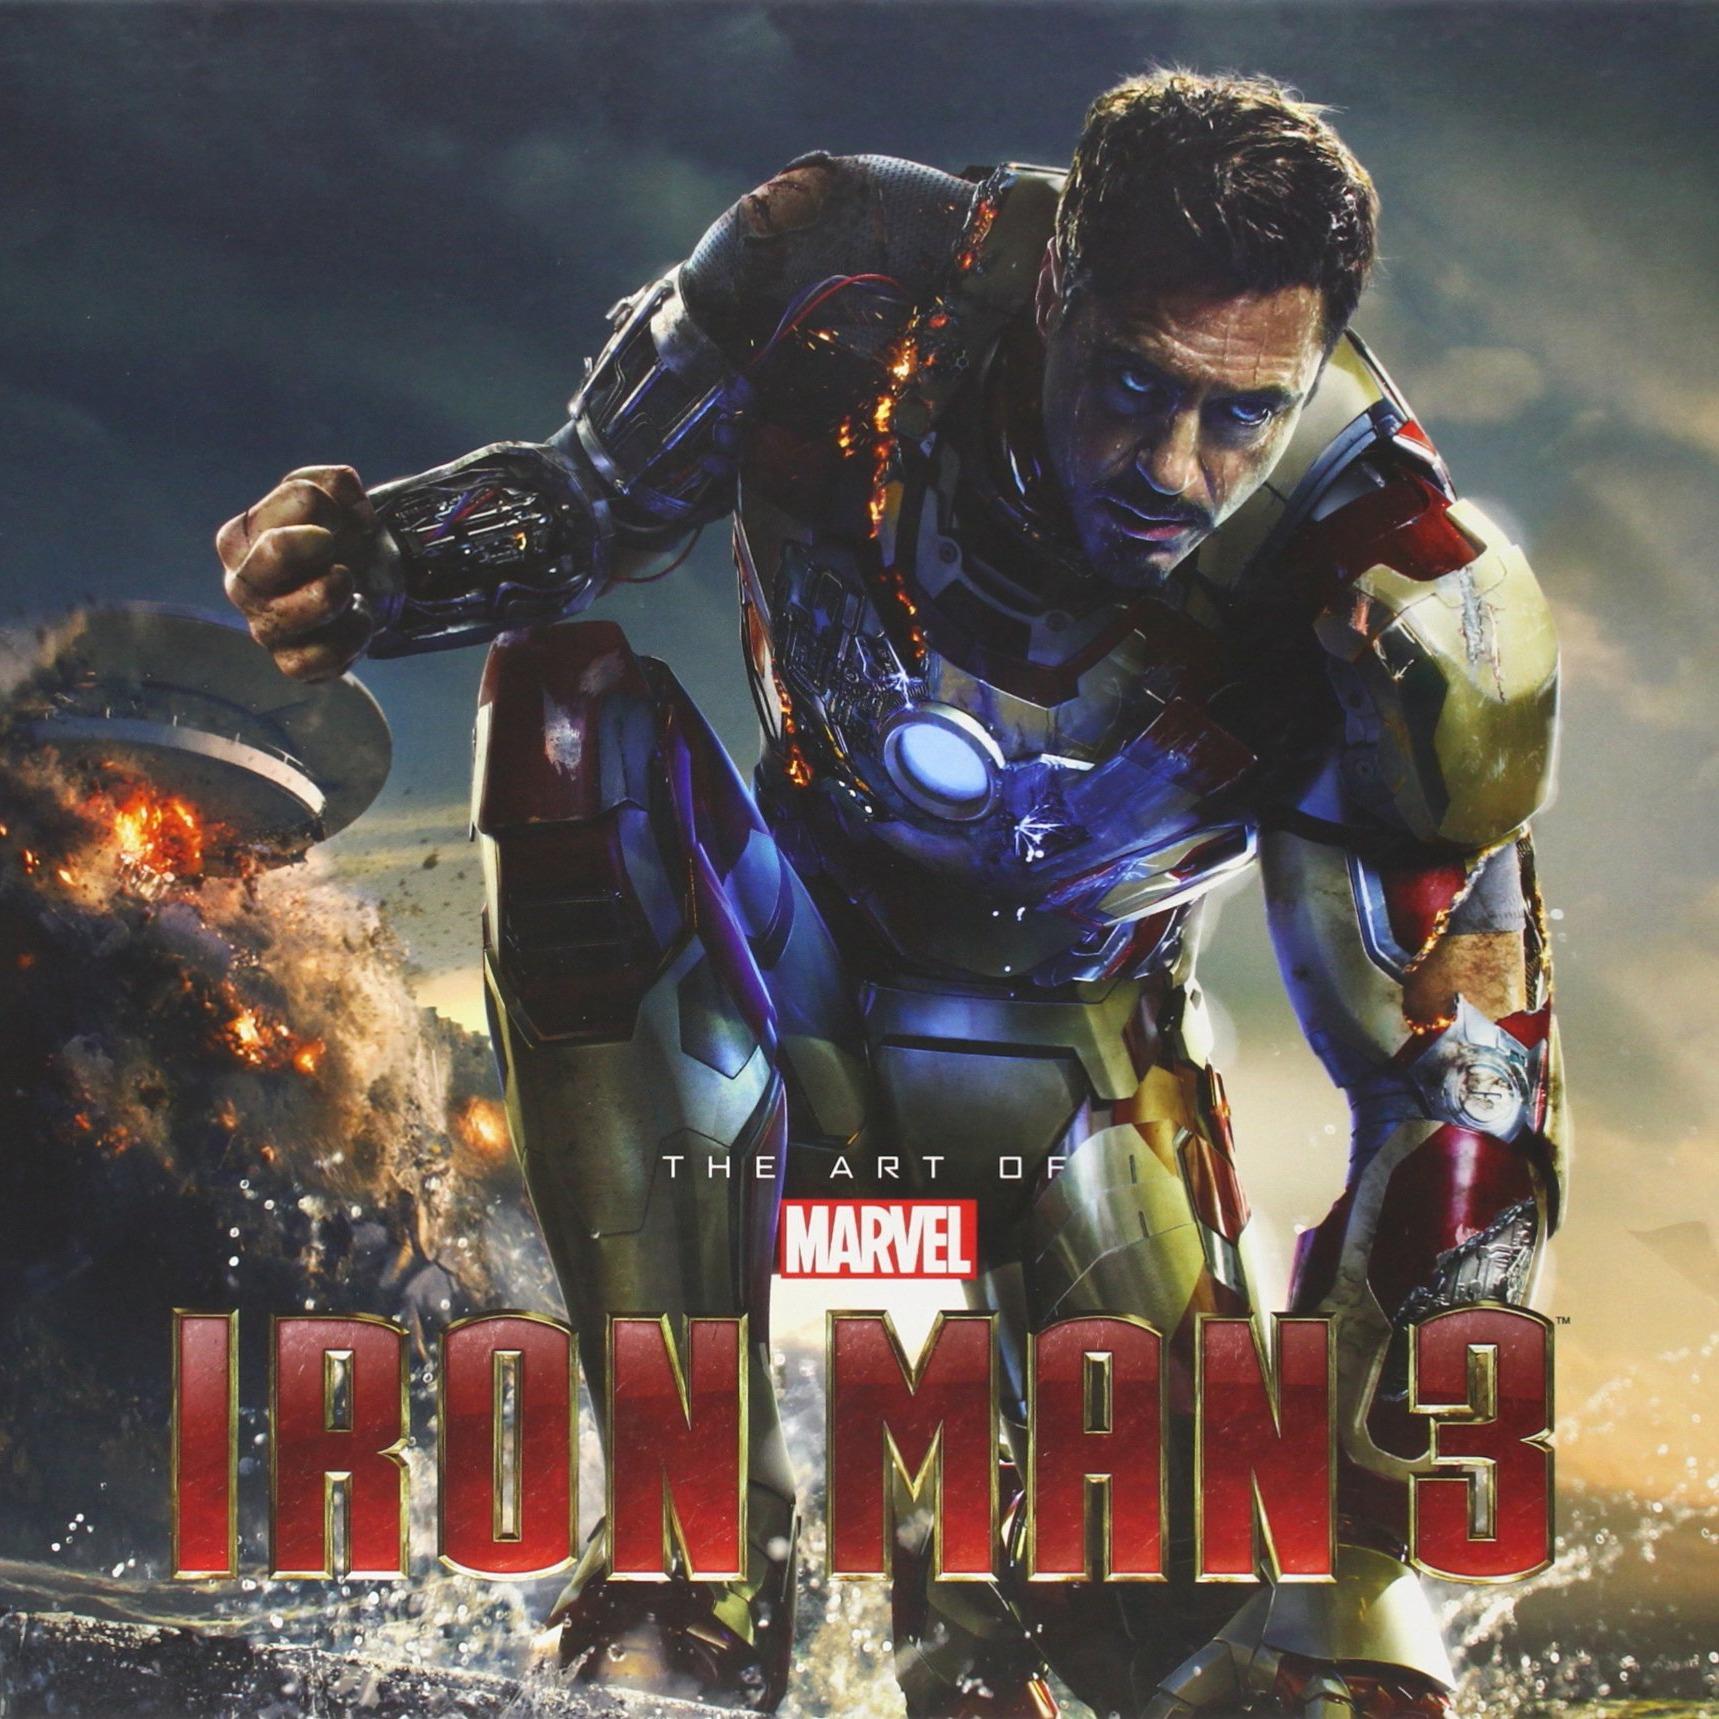 PODCAST CINEMA | critique du film IRON MAN 3 | CinéMaRadio